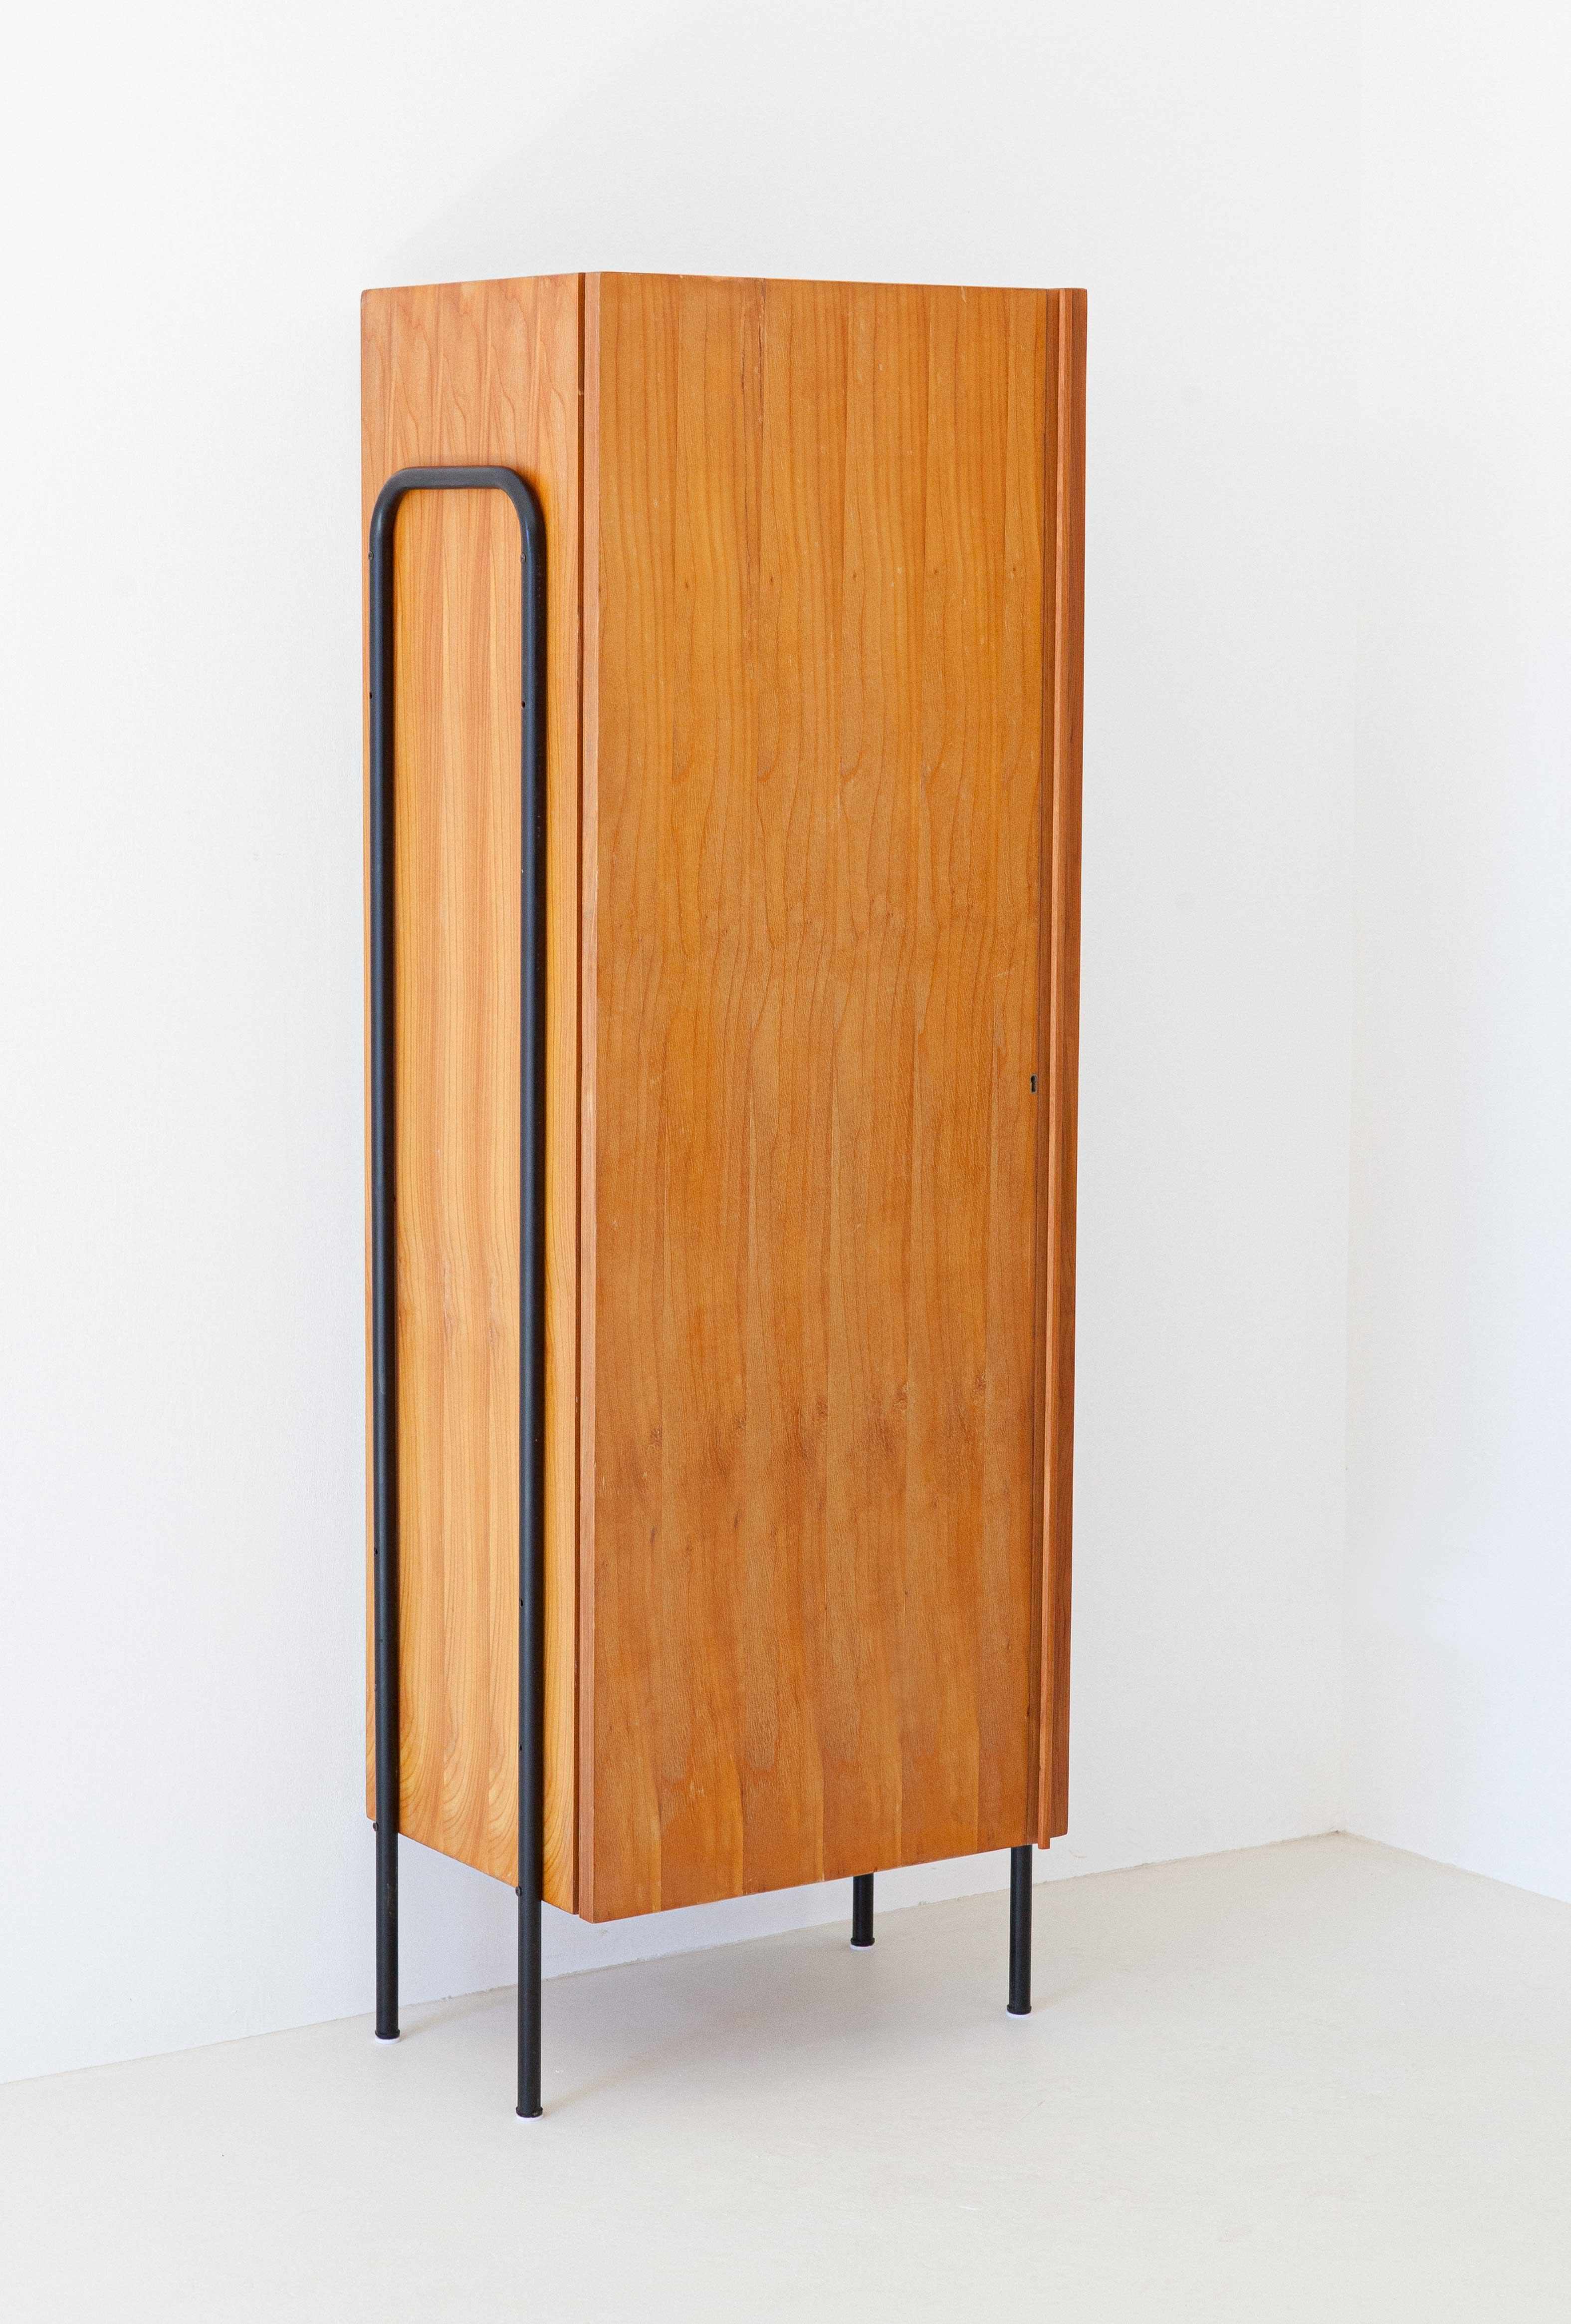 1950s-italian-light-wood-and-iron-wardrobe-cabinet--st114